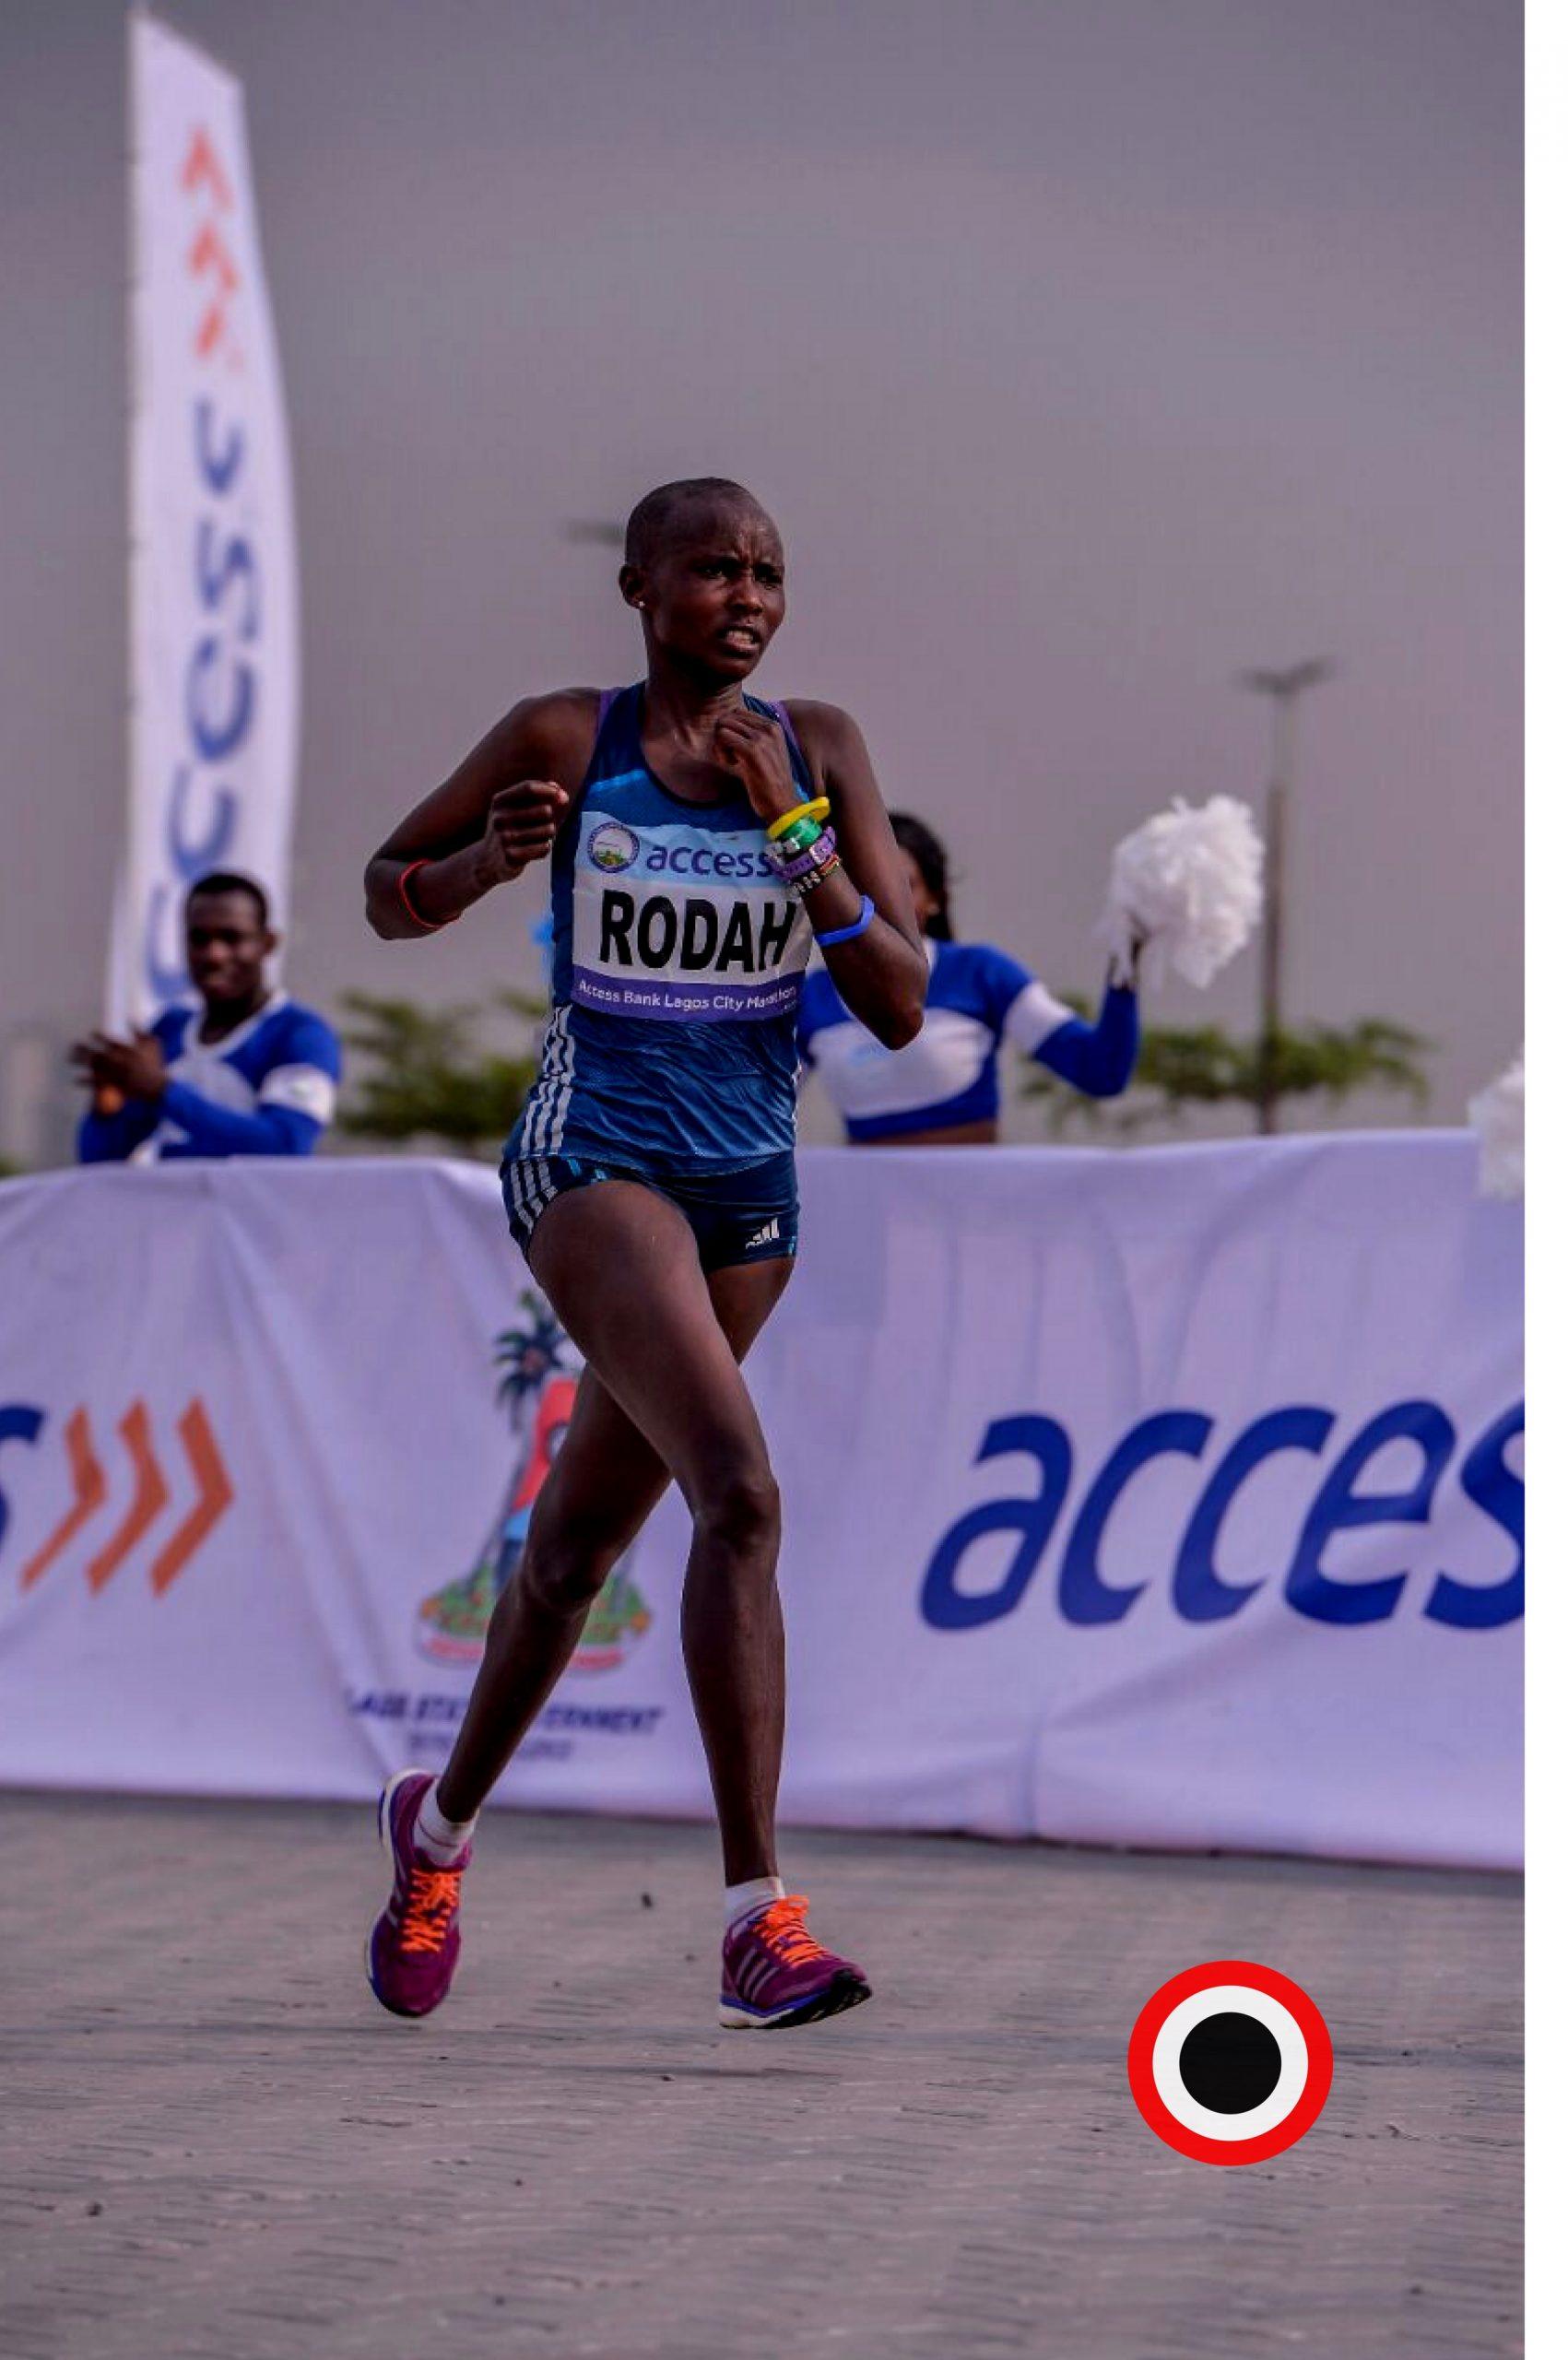 Access Bank Lagos City Marathon moved to April 10